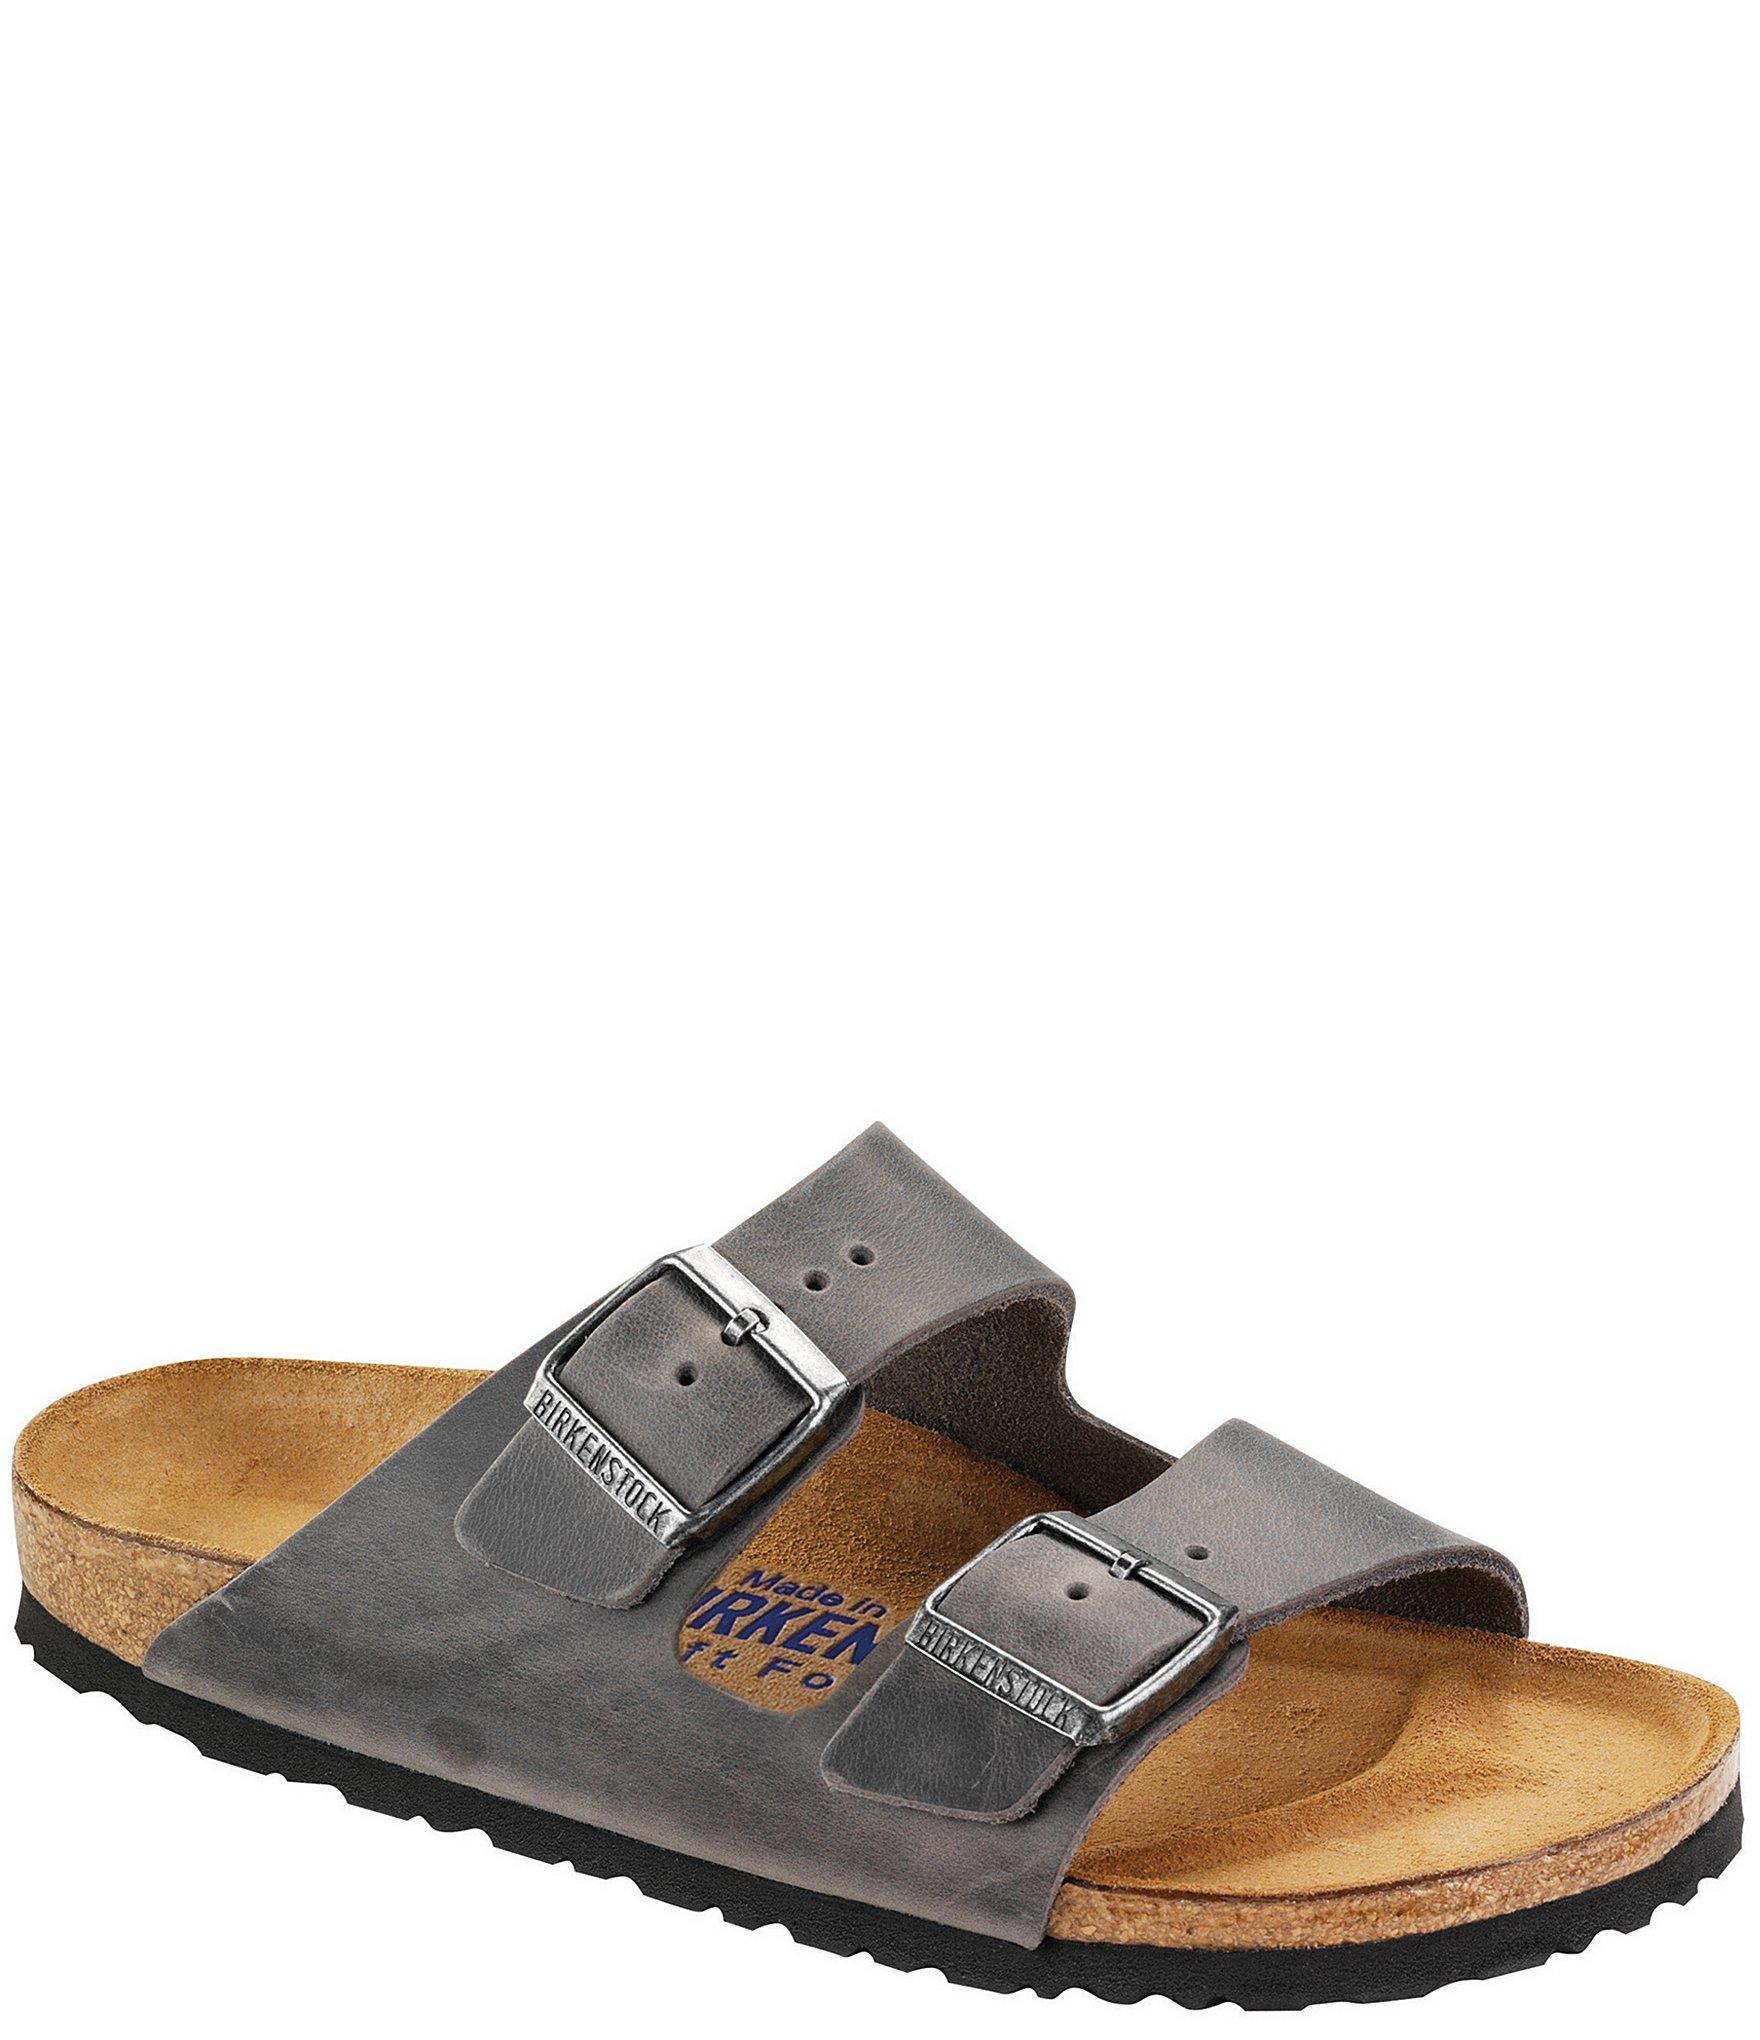 Birkenstock Arizona Men's Oiled Leather Soft Footbed Slip On Sandals